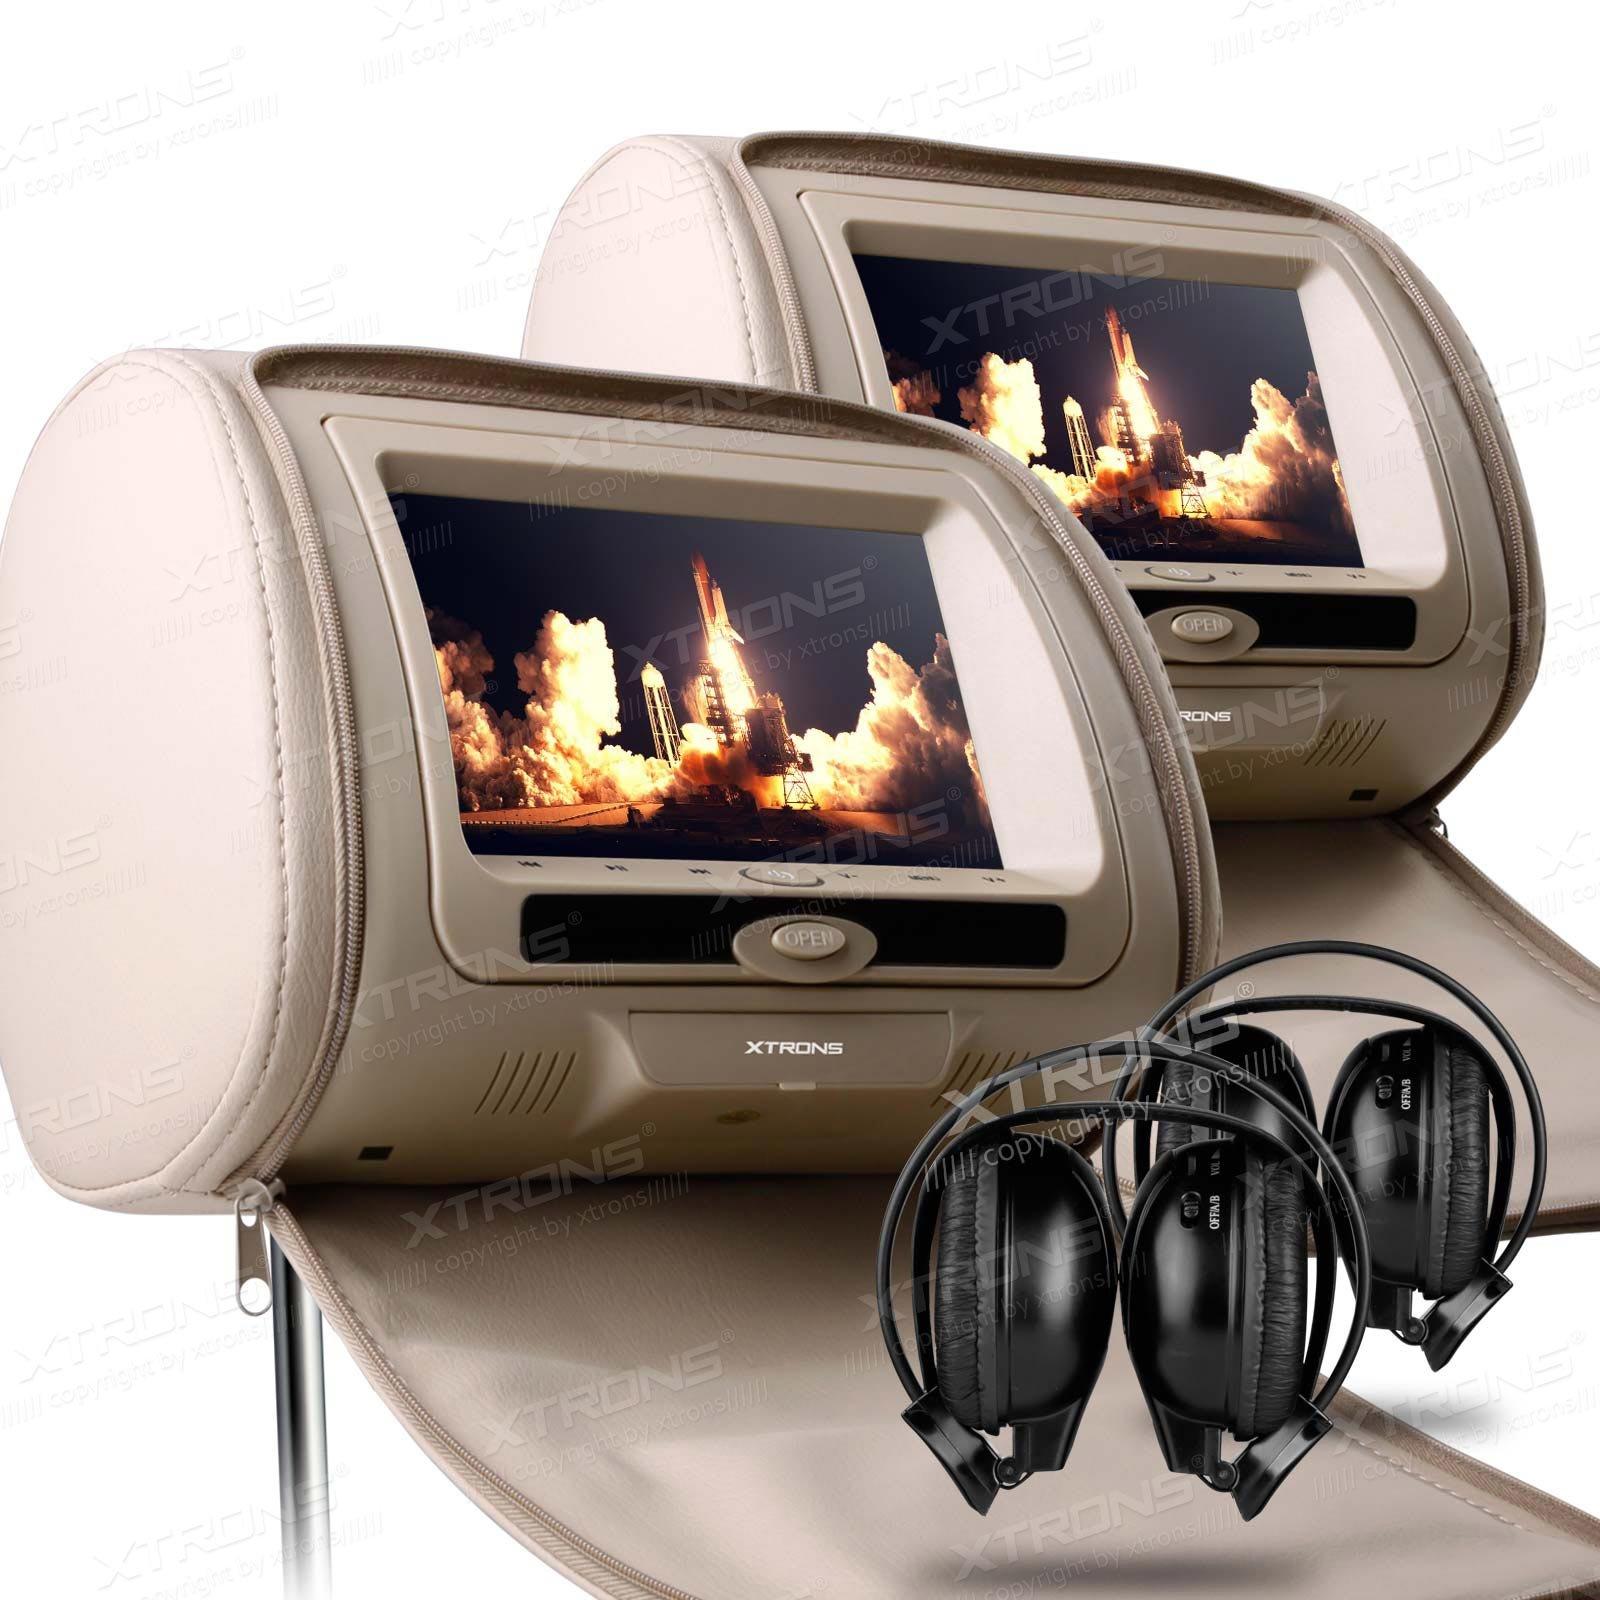 XTRONS Beige 2X Twin Car Headrest dvd player Multi-Media USB SD Slot 7'' HD Screen Game Disc IR Headphones